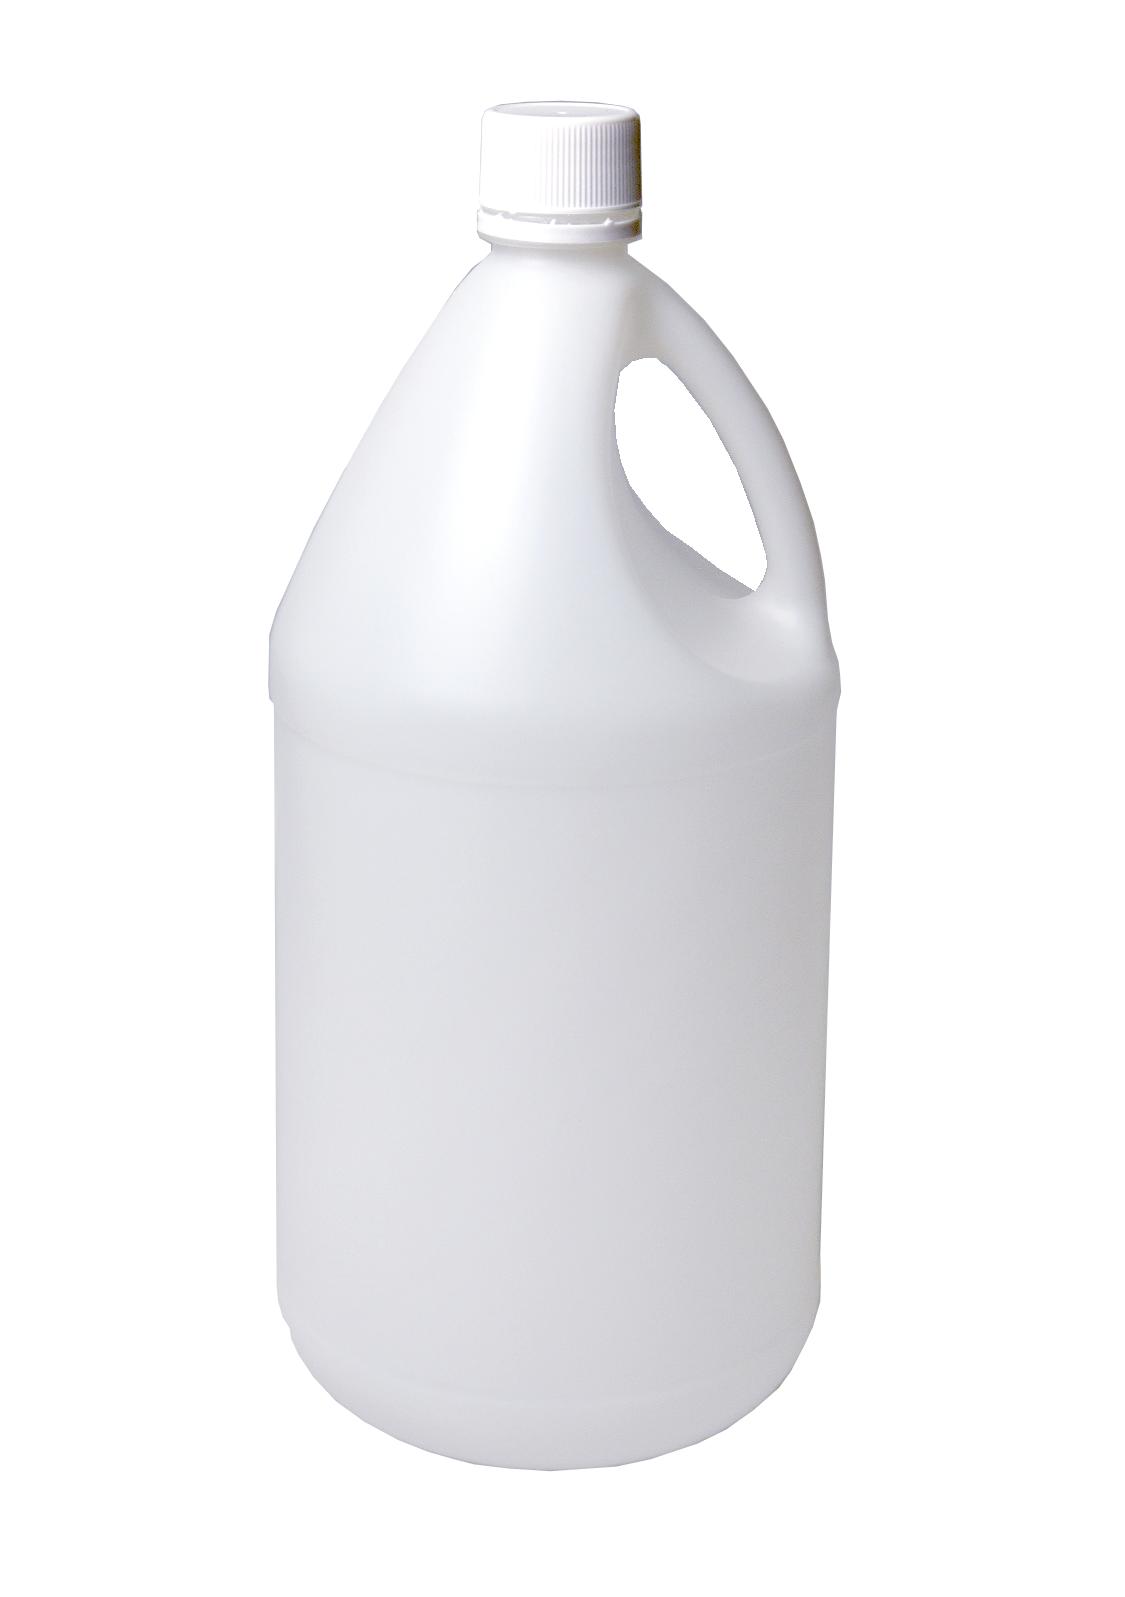 4L安全環高角瓶